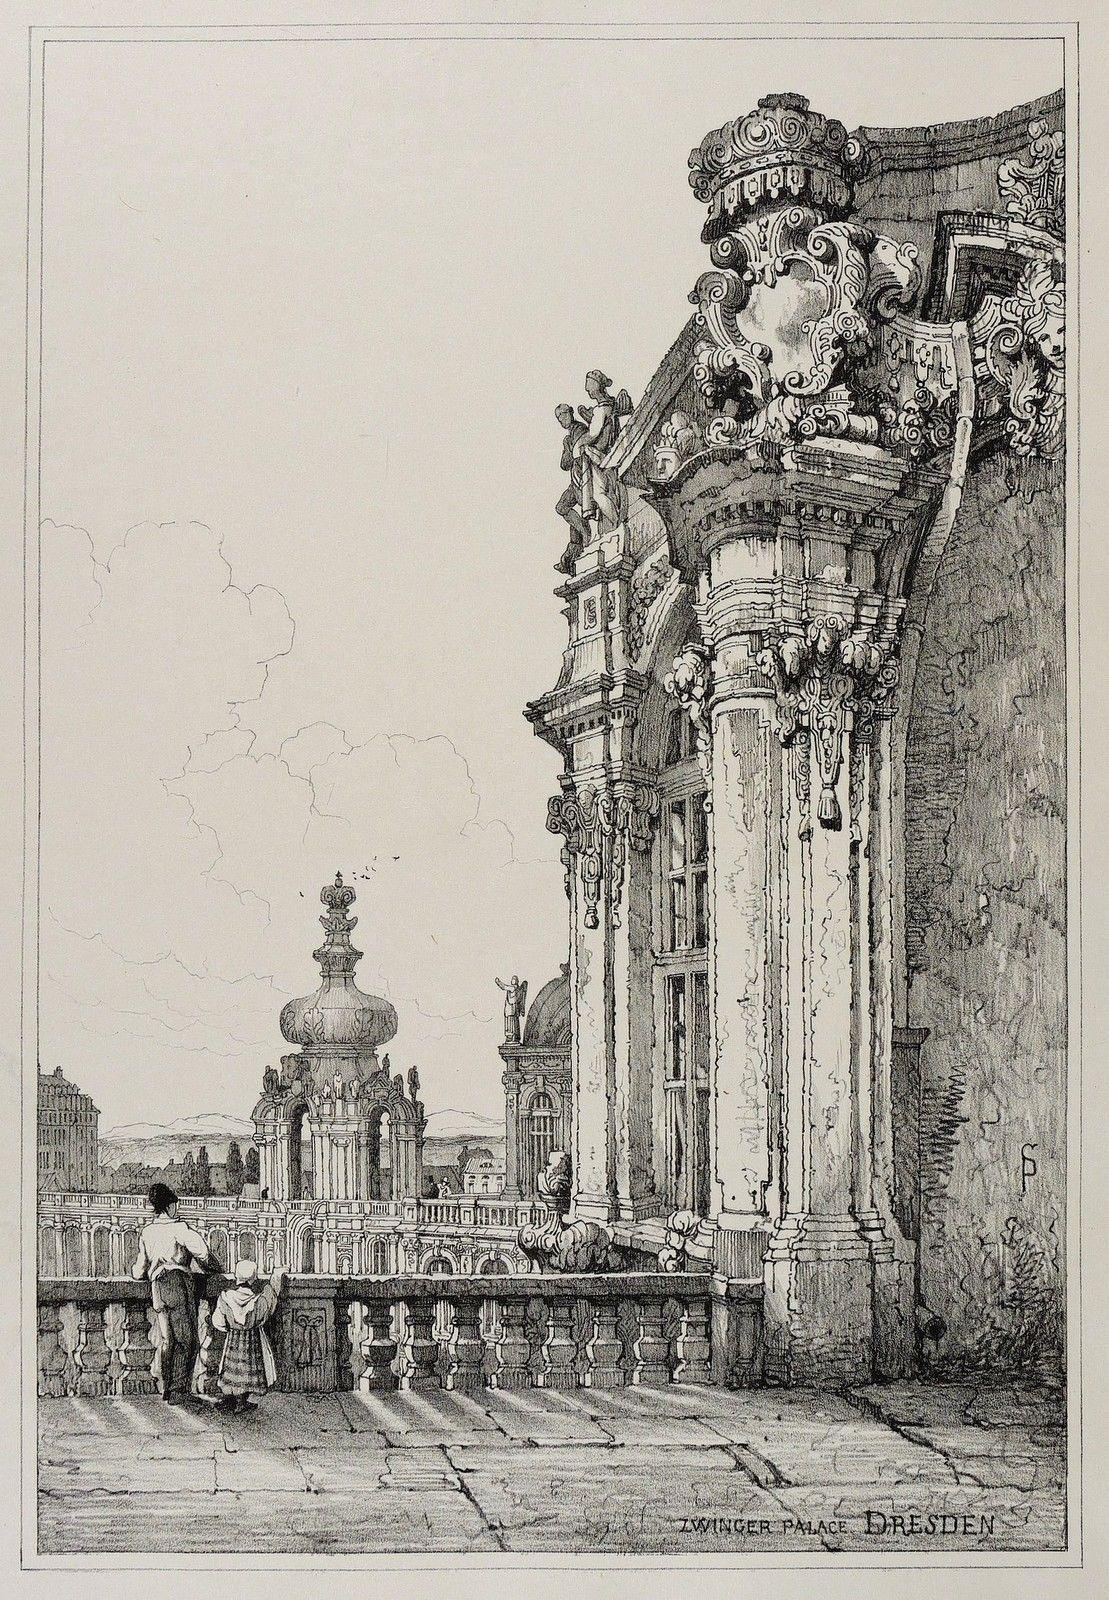 Dresden Zwinger Kronentor Samuel Prout Lithografie 1833 Ebay Lithografie Dresden Barock